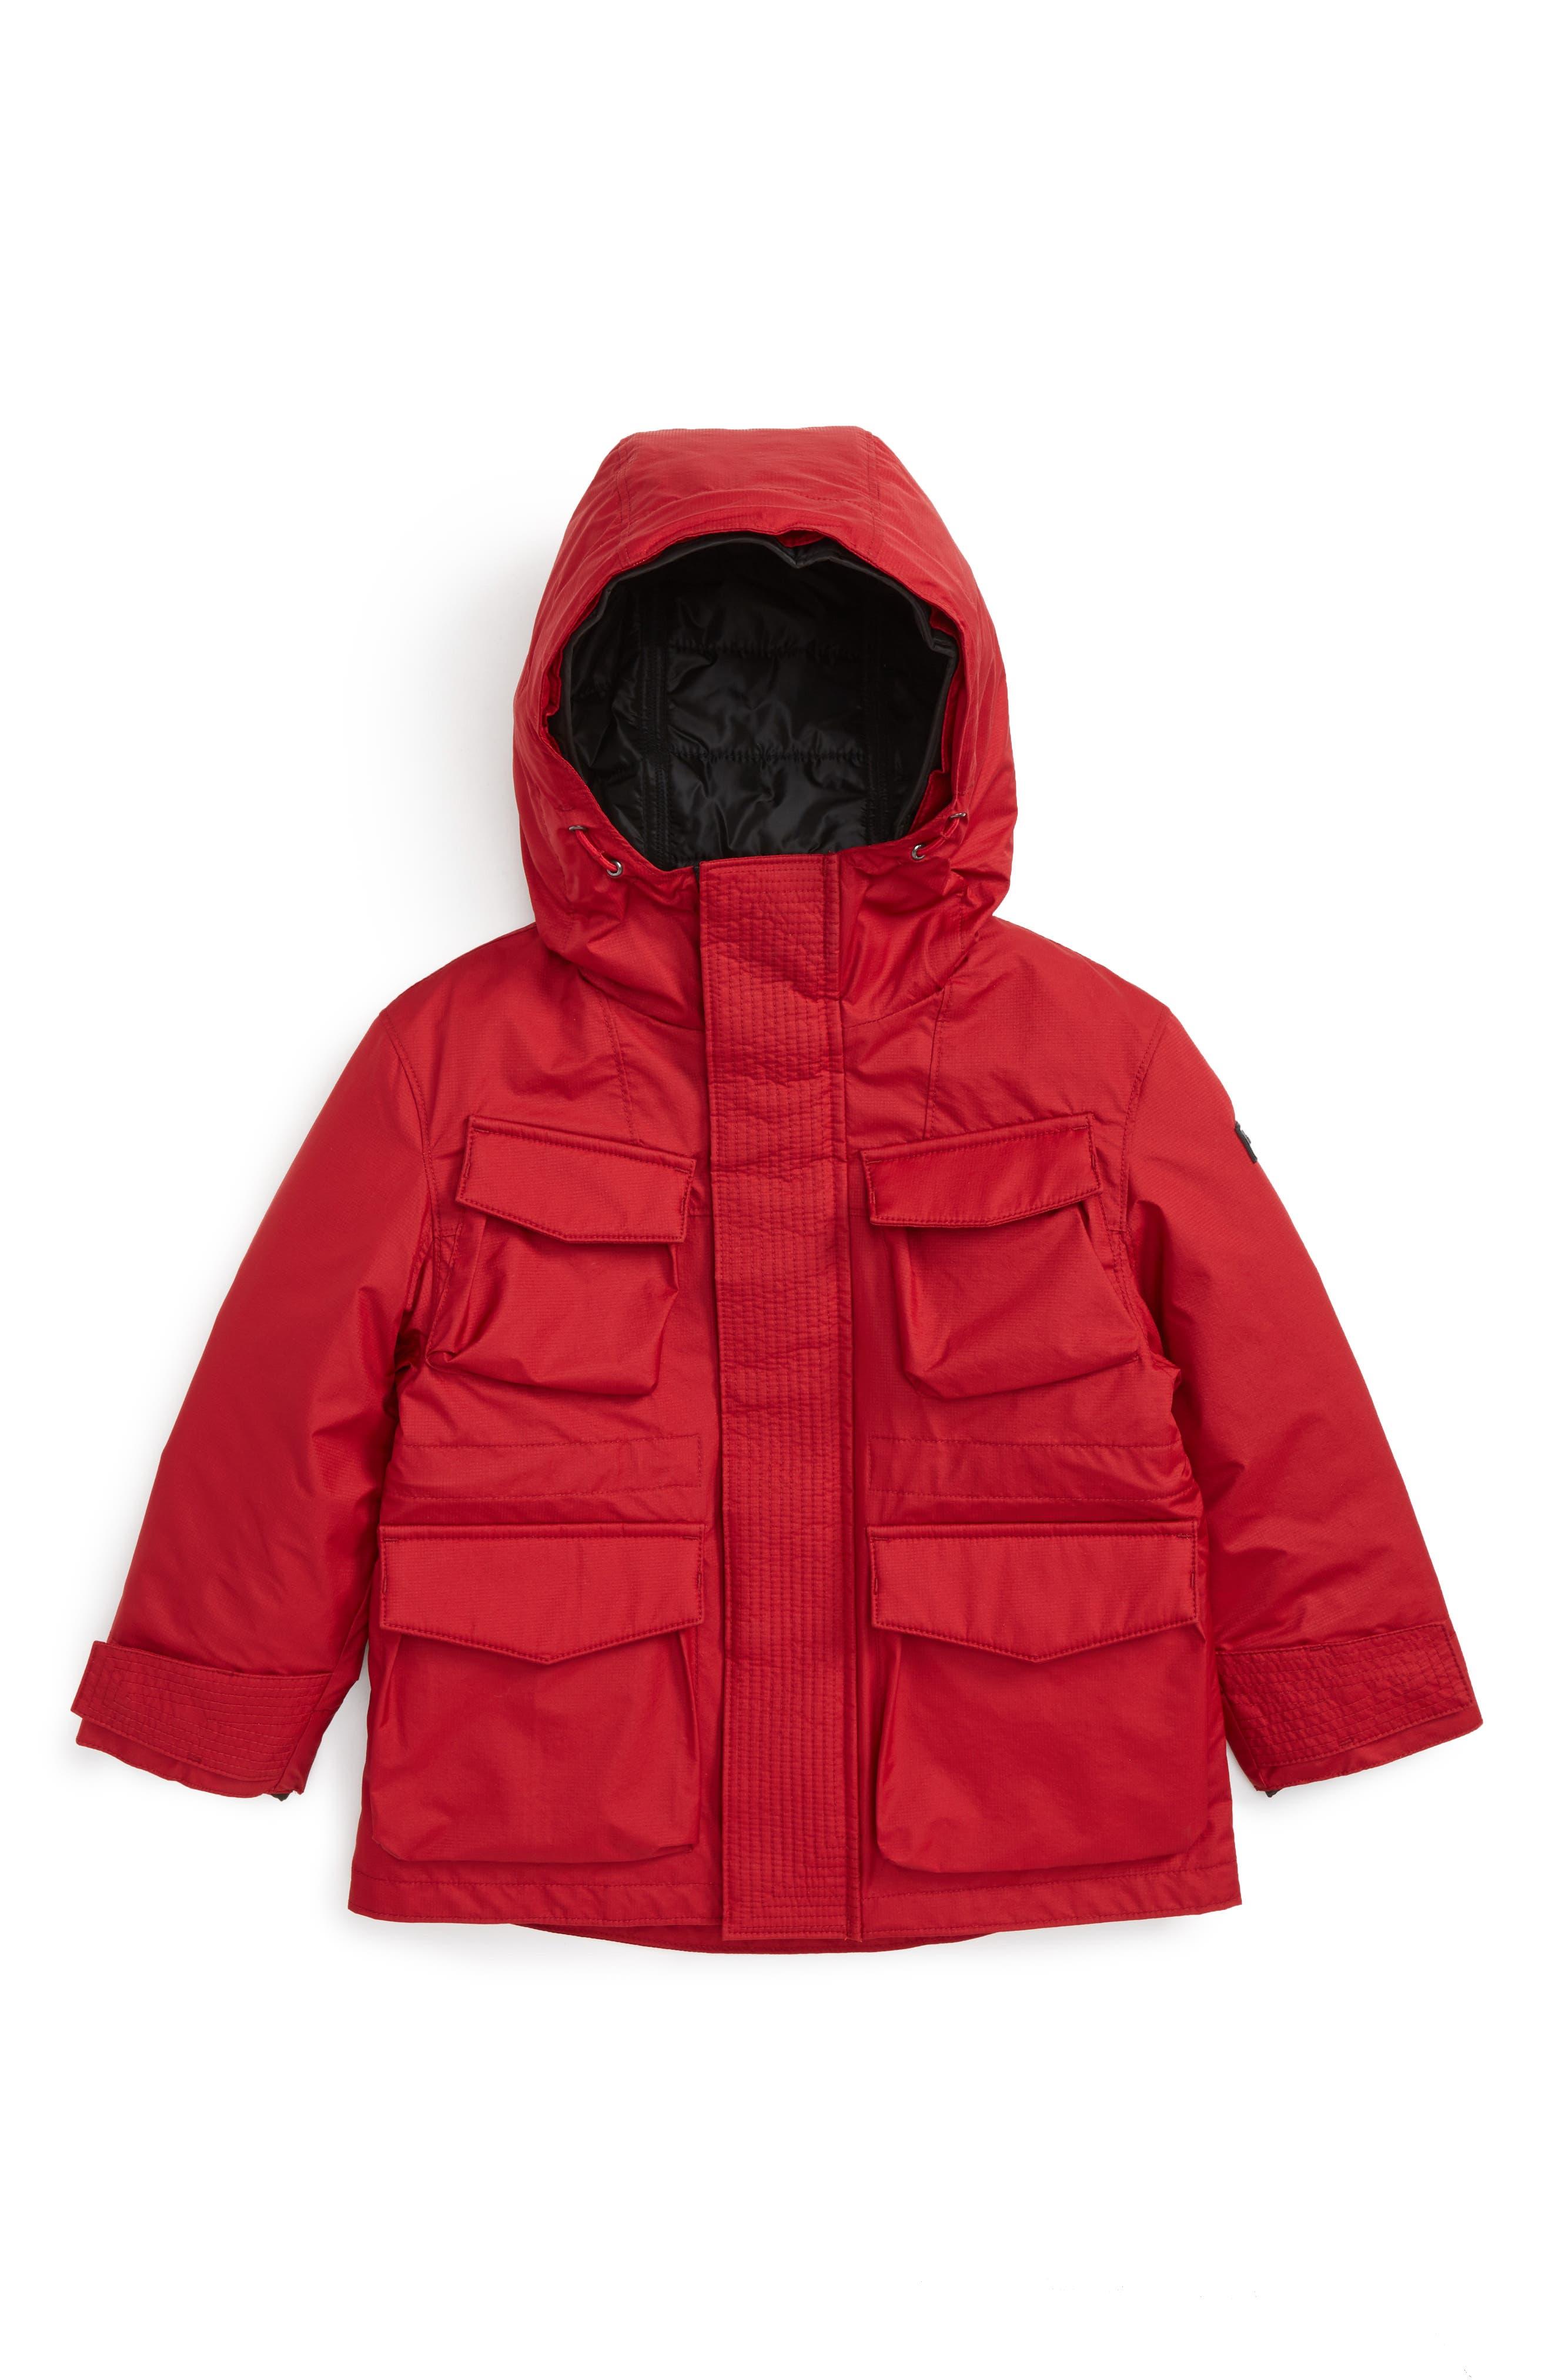 Main Image - Burberry Terrick 3-in-1 Jacket (Little Boys & Big Boys)